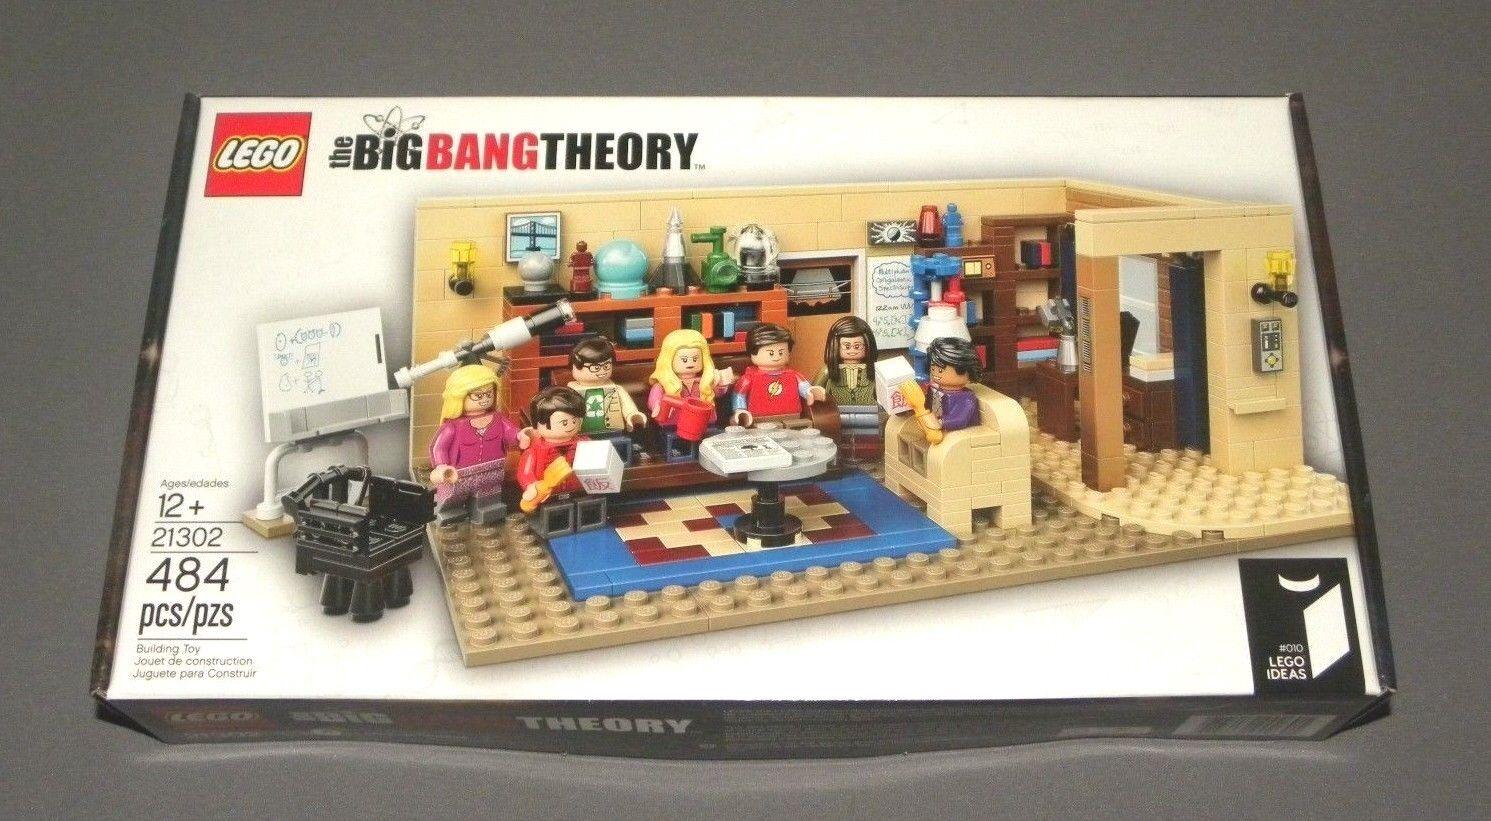 LEGO The Big Bang Theory Set 21302  010 LEGO Ideas w Sheldon, 7 Minifigures